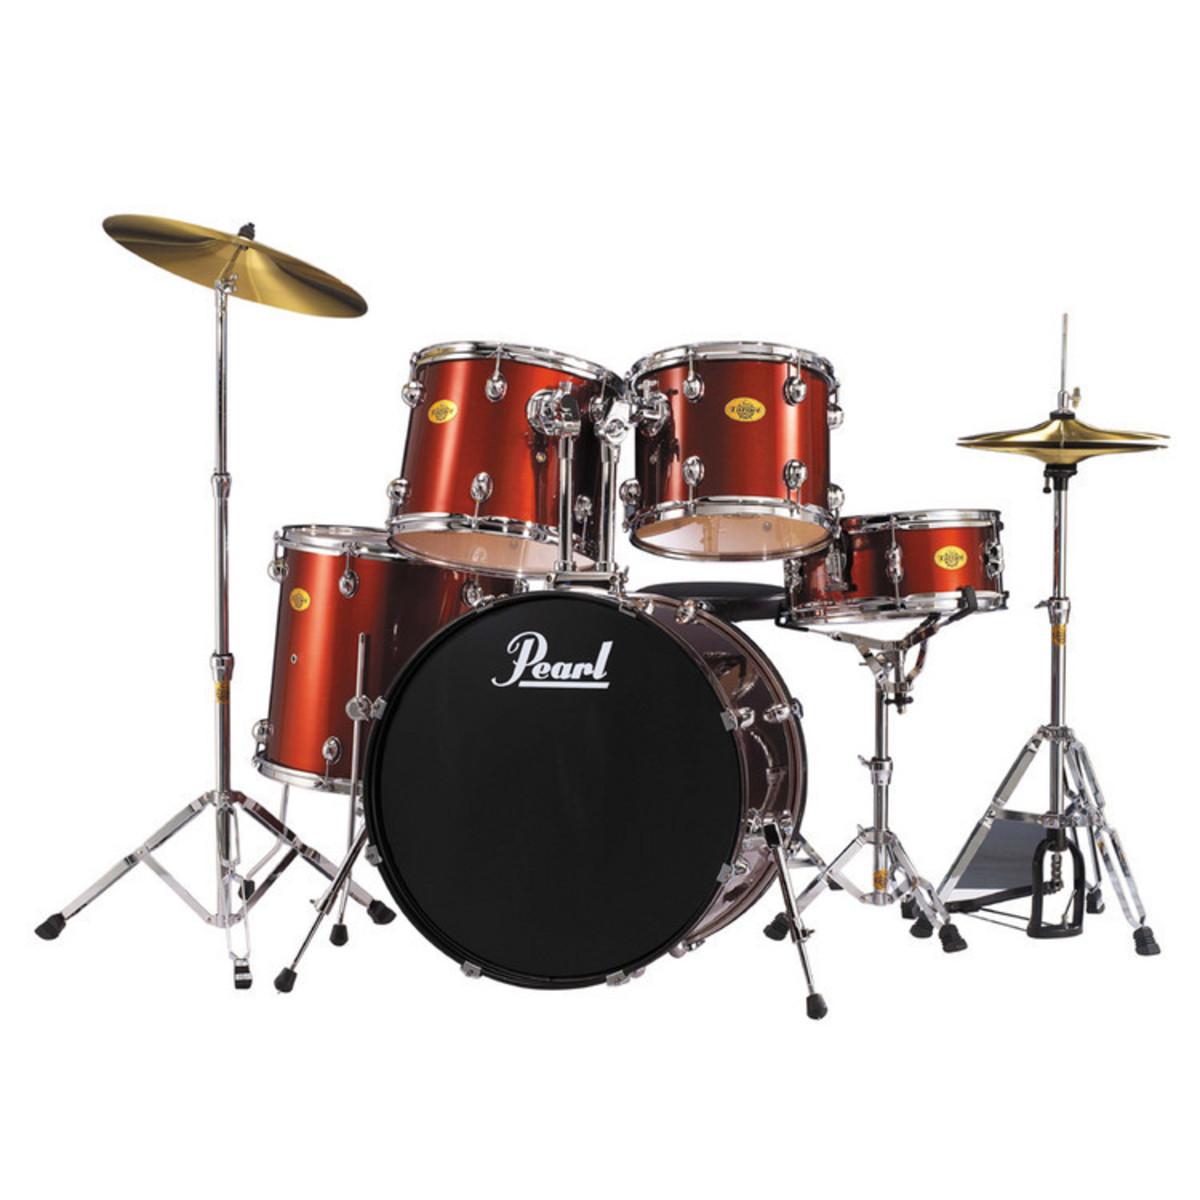 pearl target acoustic drum kit wine red ex demo at gear4music. Black Bedroom Furniture Sets. Home Design Ideas